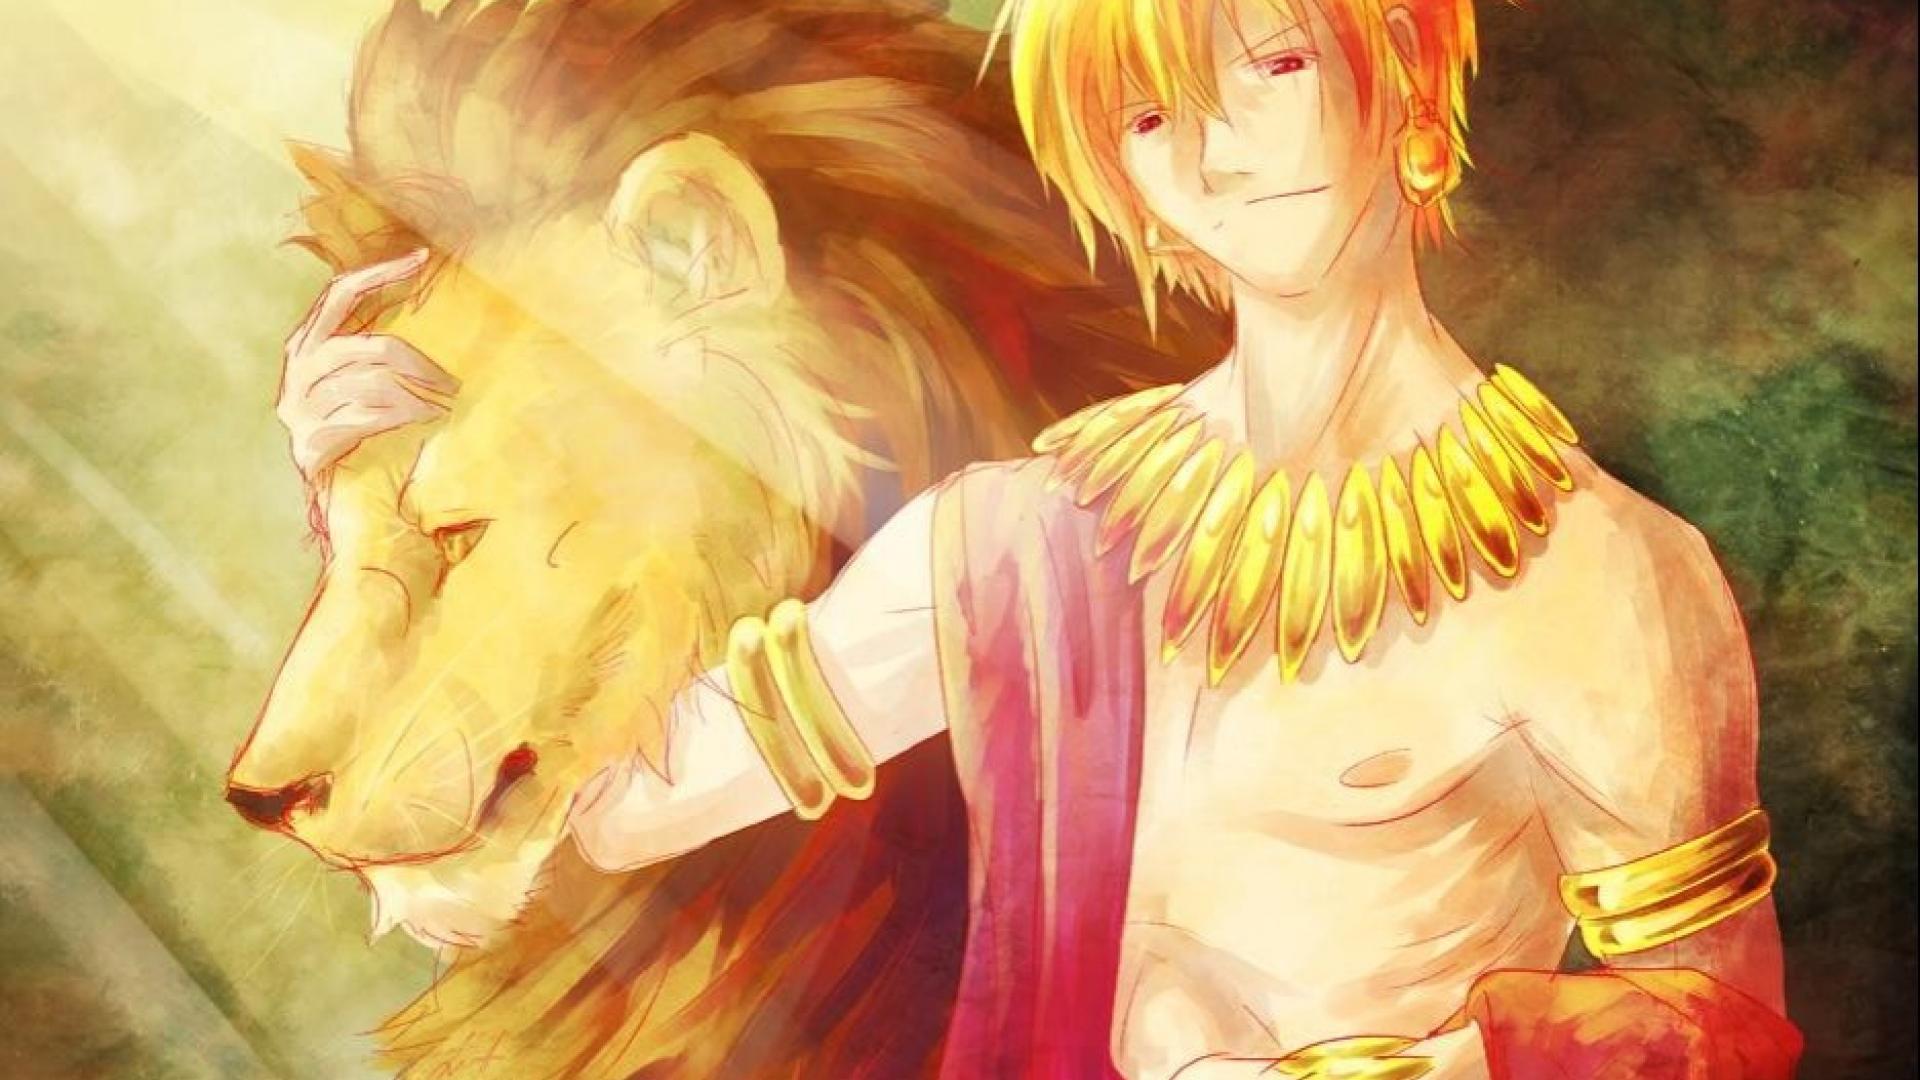 Gilgamesh anime boys lions fatezero fate series wallpaper 2667 1920x1080